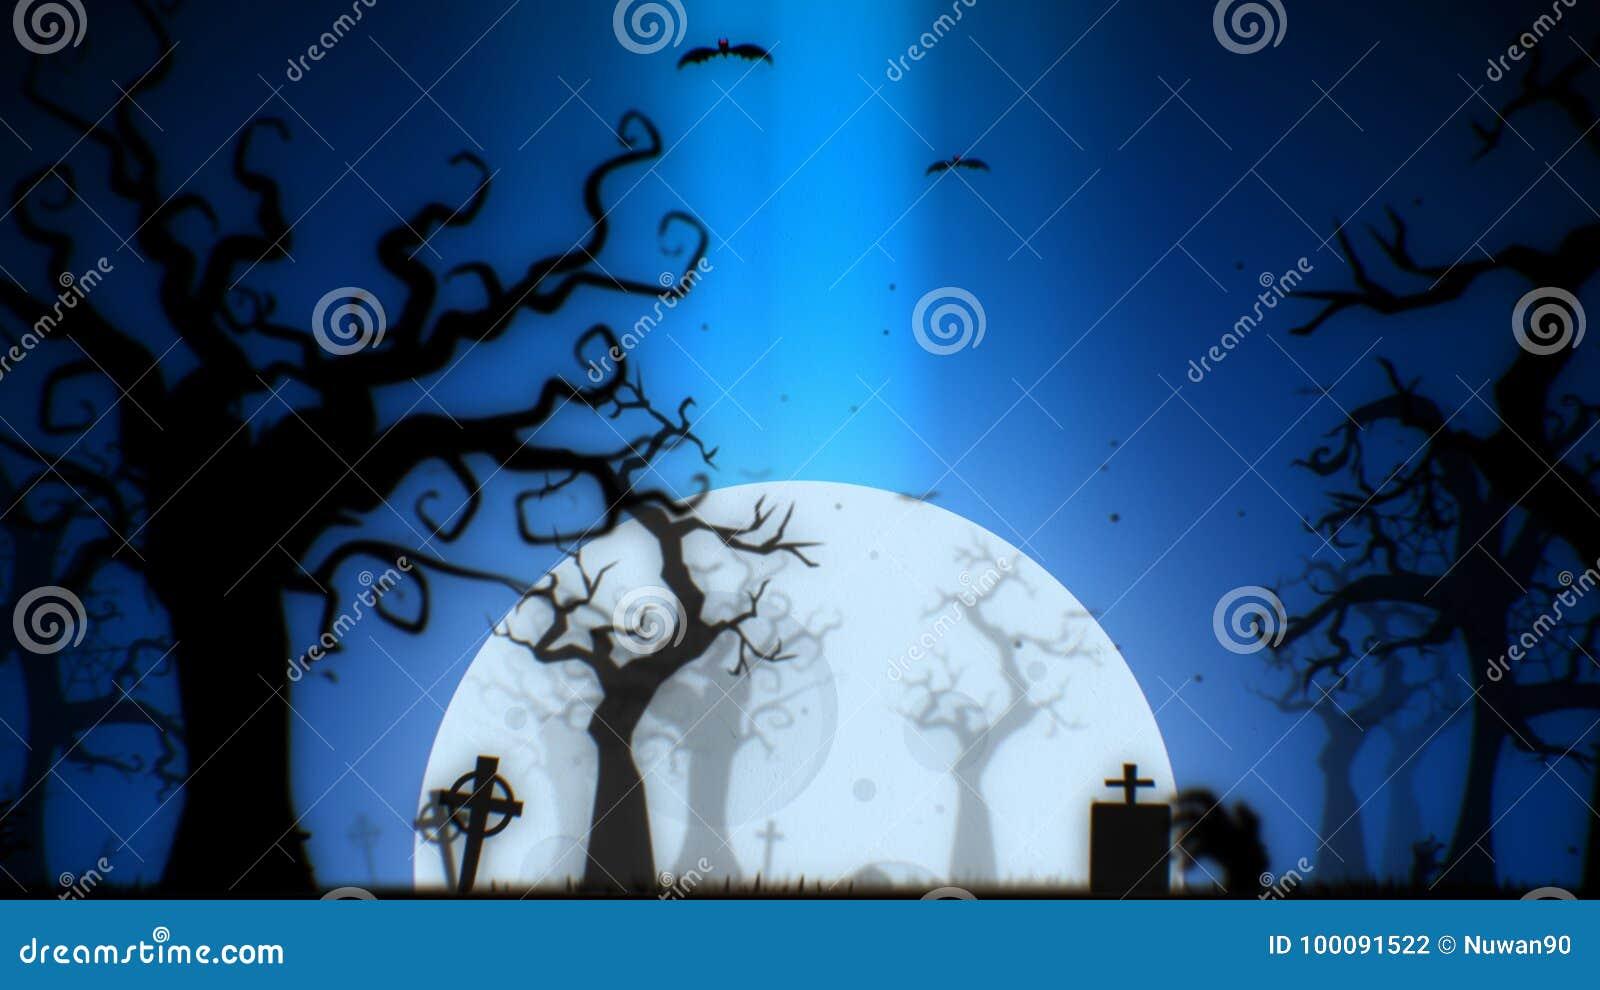 Thème bleu de fond fantasmagorique de Halloween, avec l arbre, la lune, les battes, la main de zombi et le cimetière fantasmagori